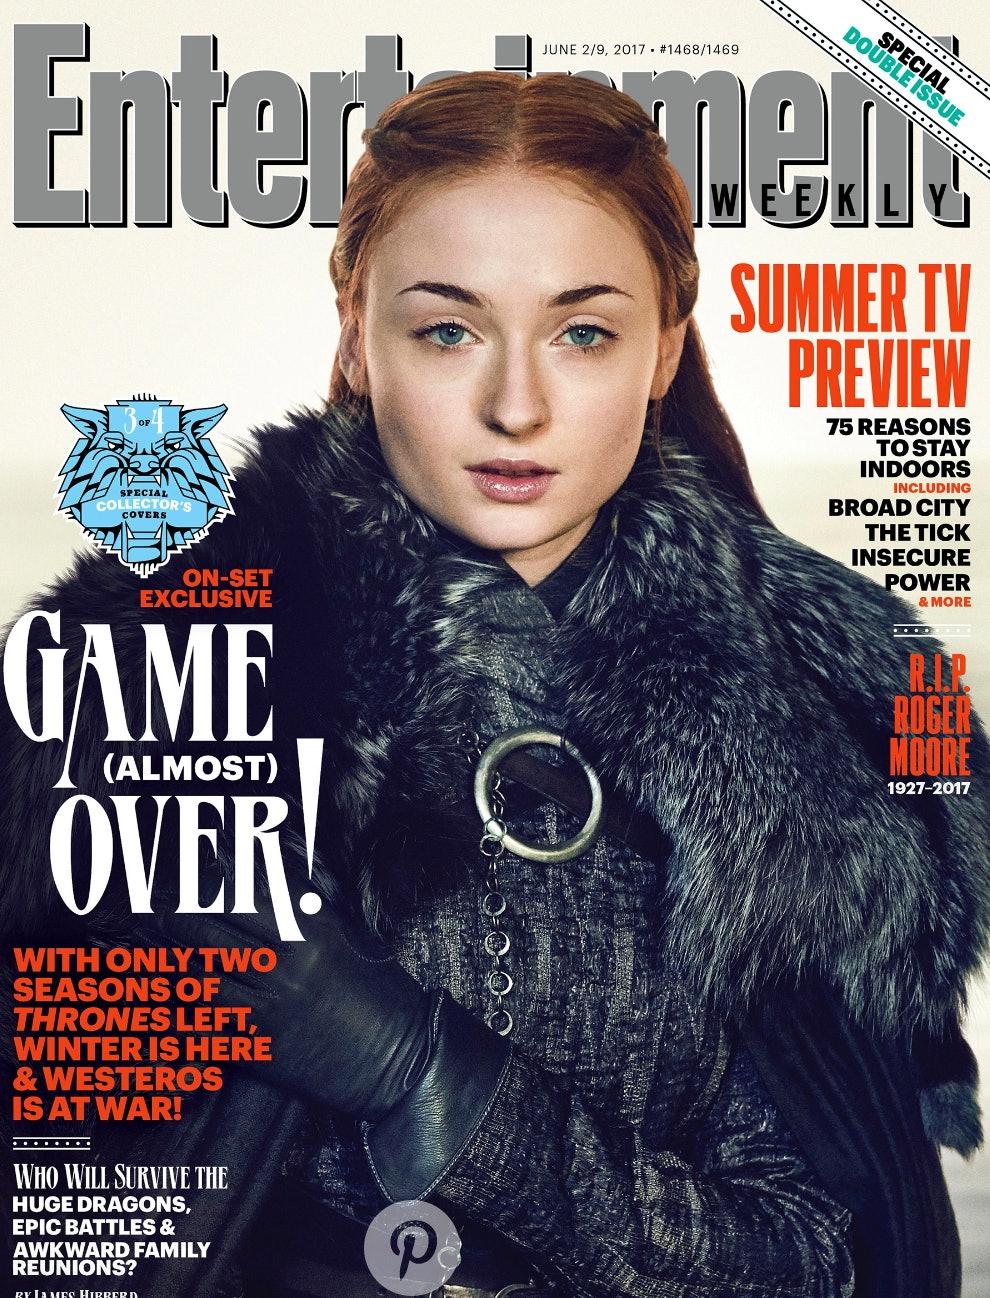 Sansa Stark in 'Game of Thrones' Season 7